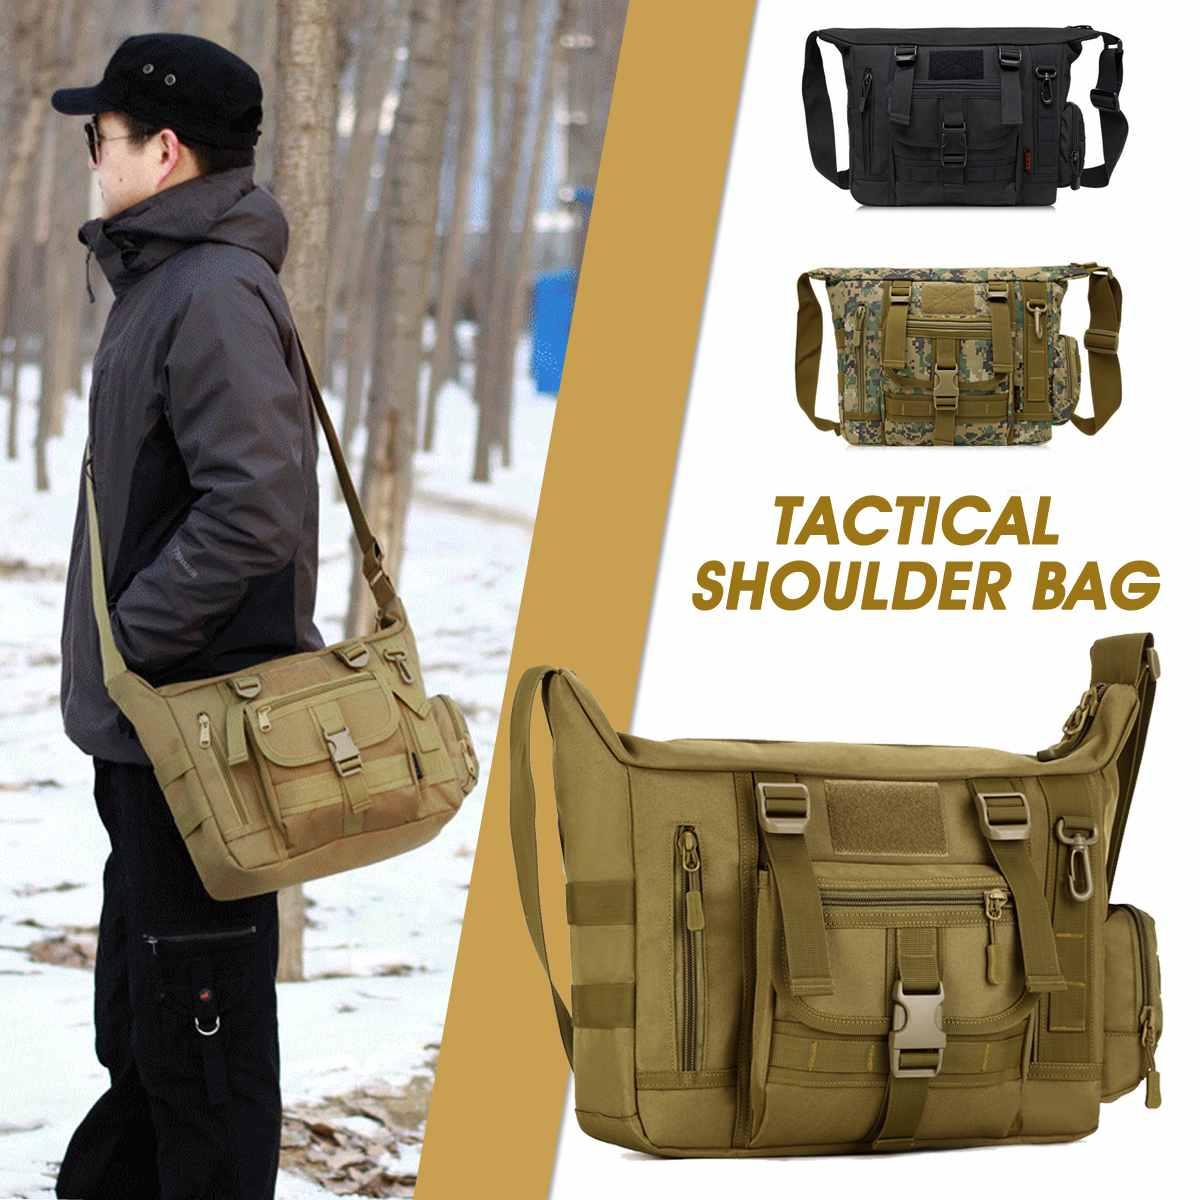 Osmond Outdoor Anti Theft Tactical Shoulder Bag Travel Camping Sports Handbags Hiking Fishing Hunting Climbing Trekking Backpack